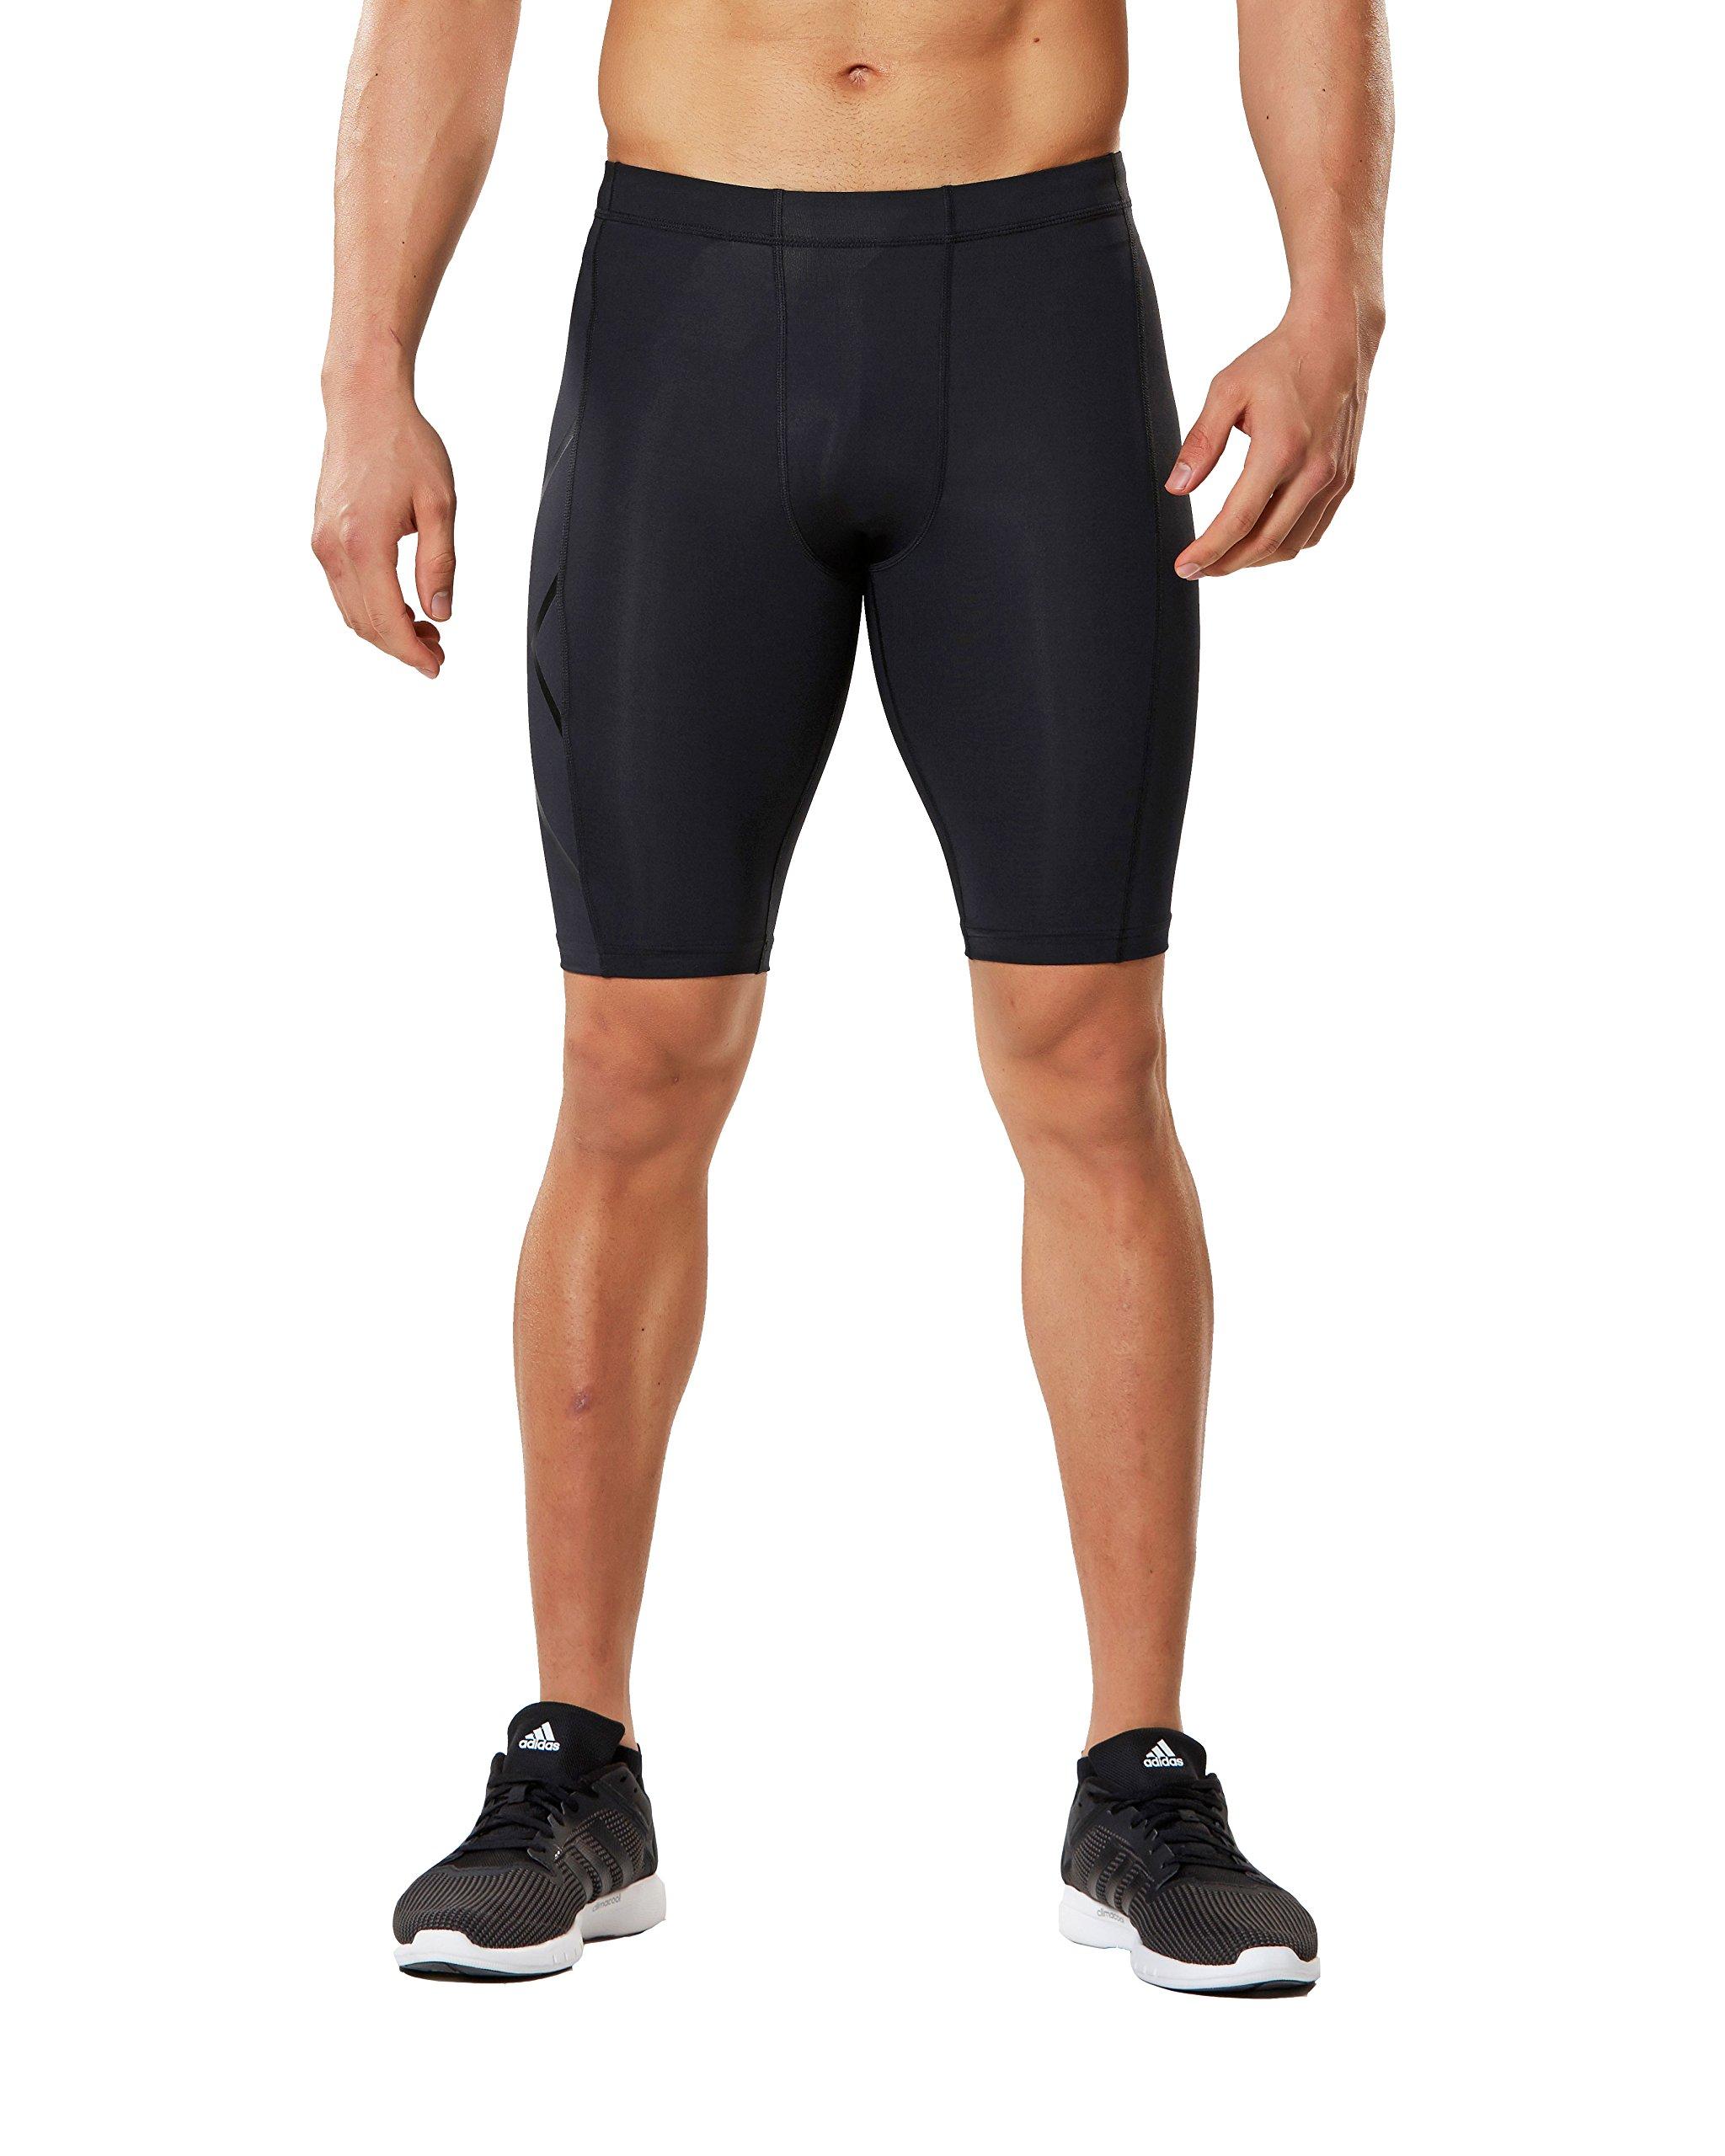 2XU Men's Core Compression Shorts, Black/Nero, Medium by 2XU (Image #2)